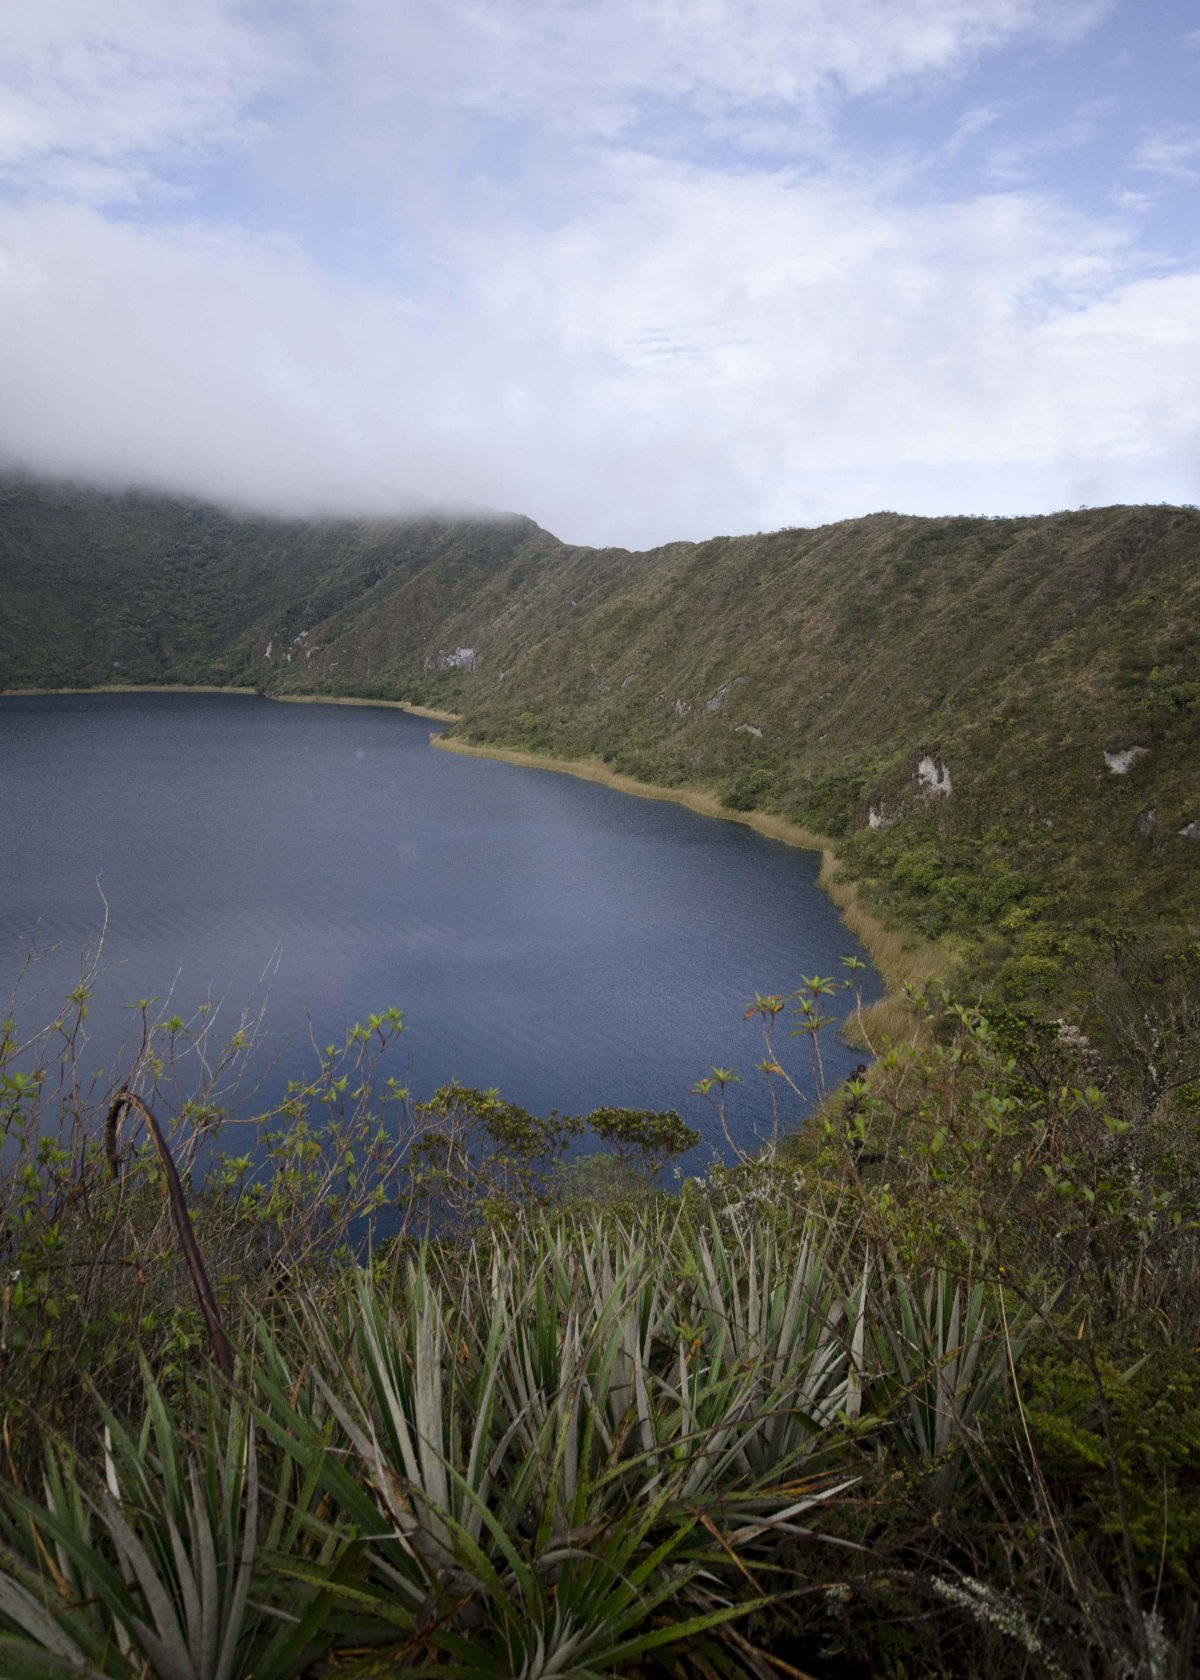 View of the Lake from the Hiking Trail, Laguna Cuicocha, Ecuador